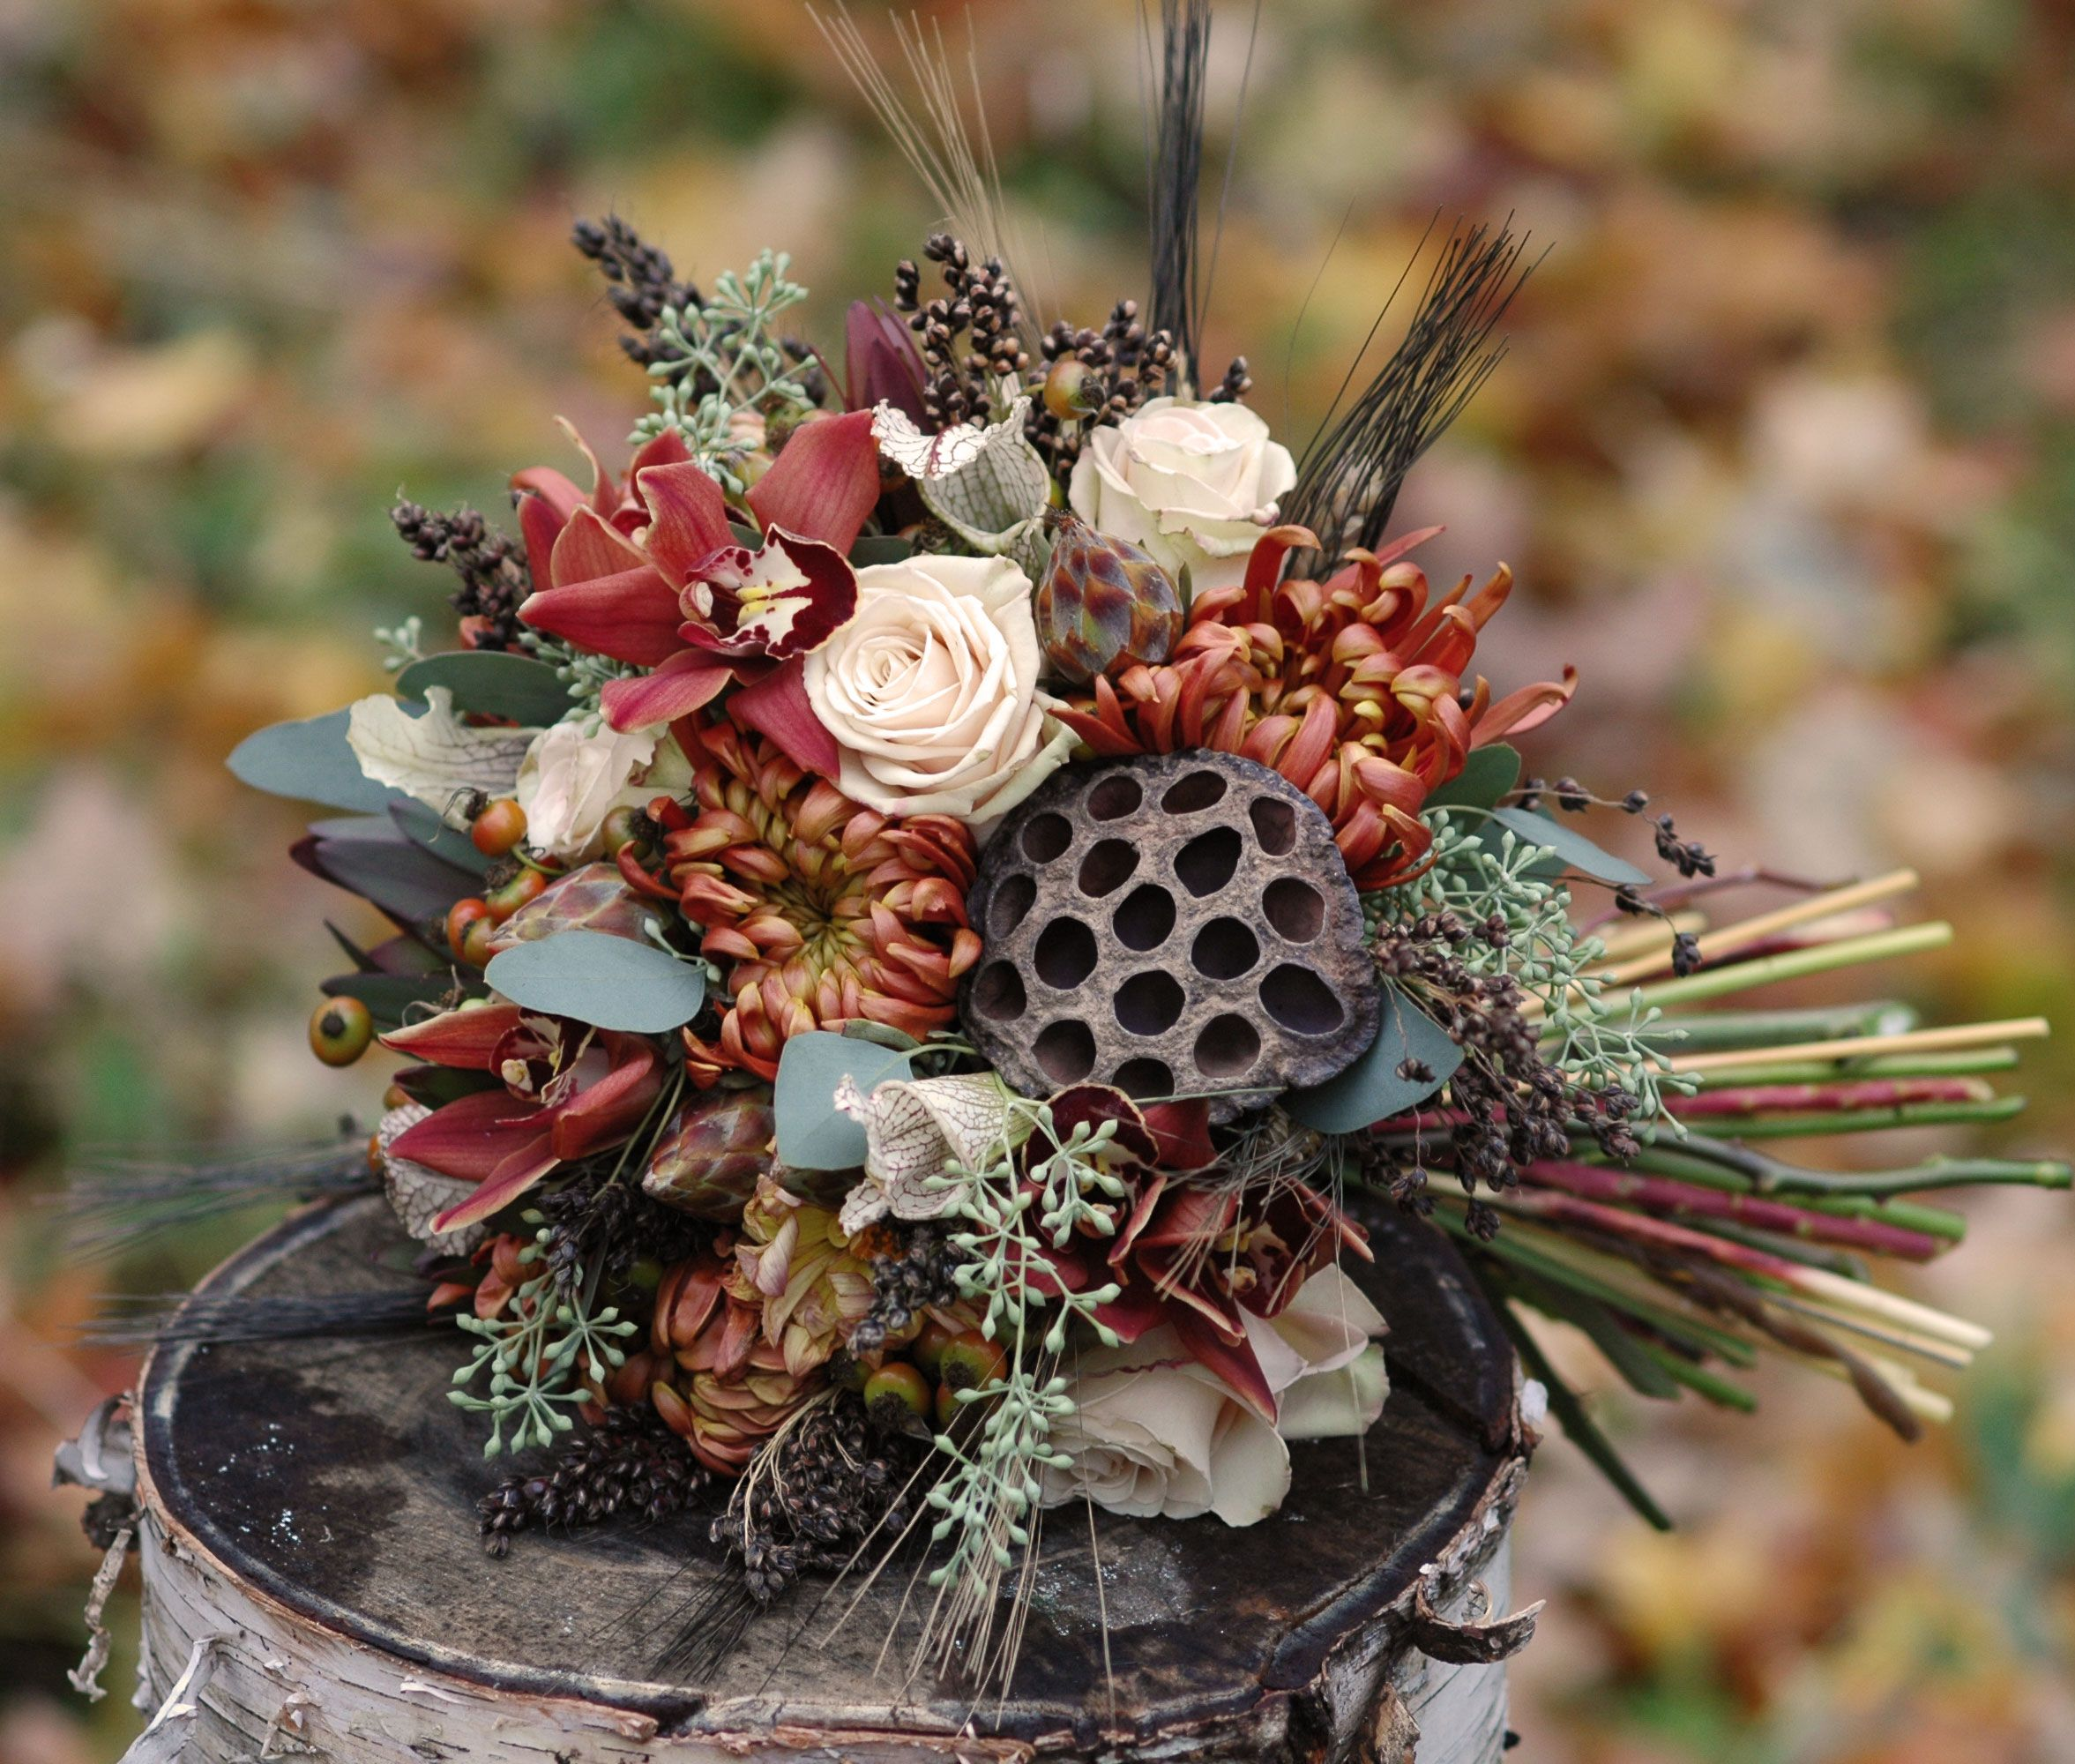 Vermont Wedding Flowers: Fall Inspired Bridal Bouquet Featuring Copper Cymbidium